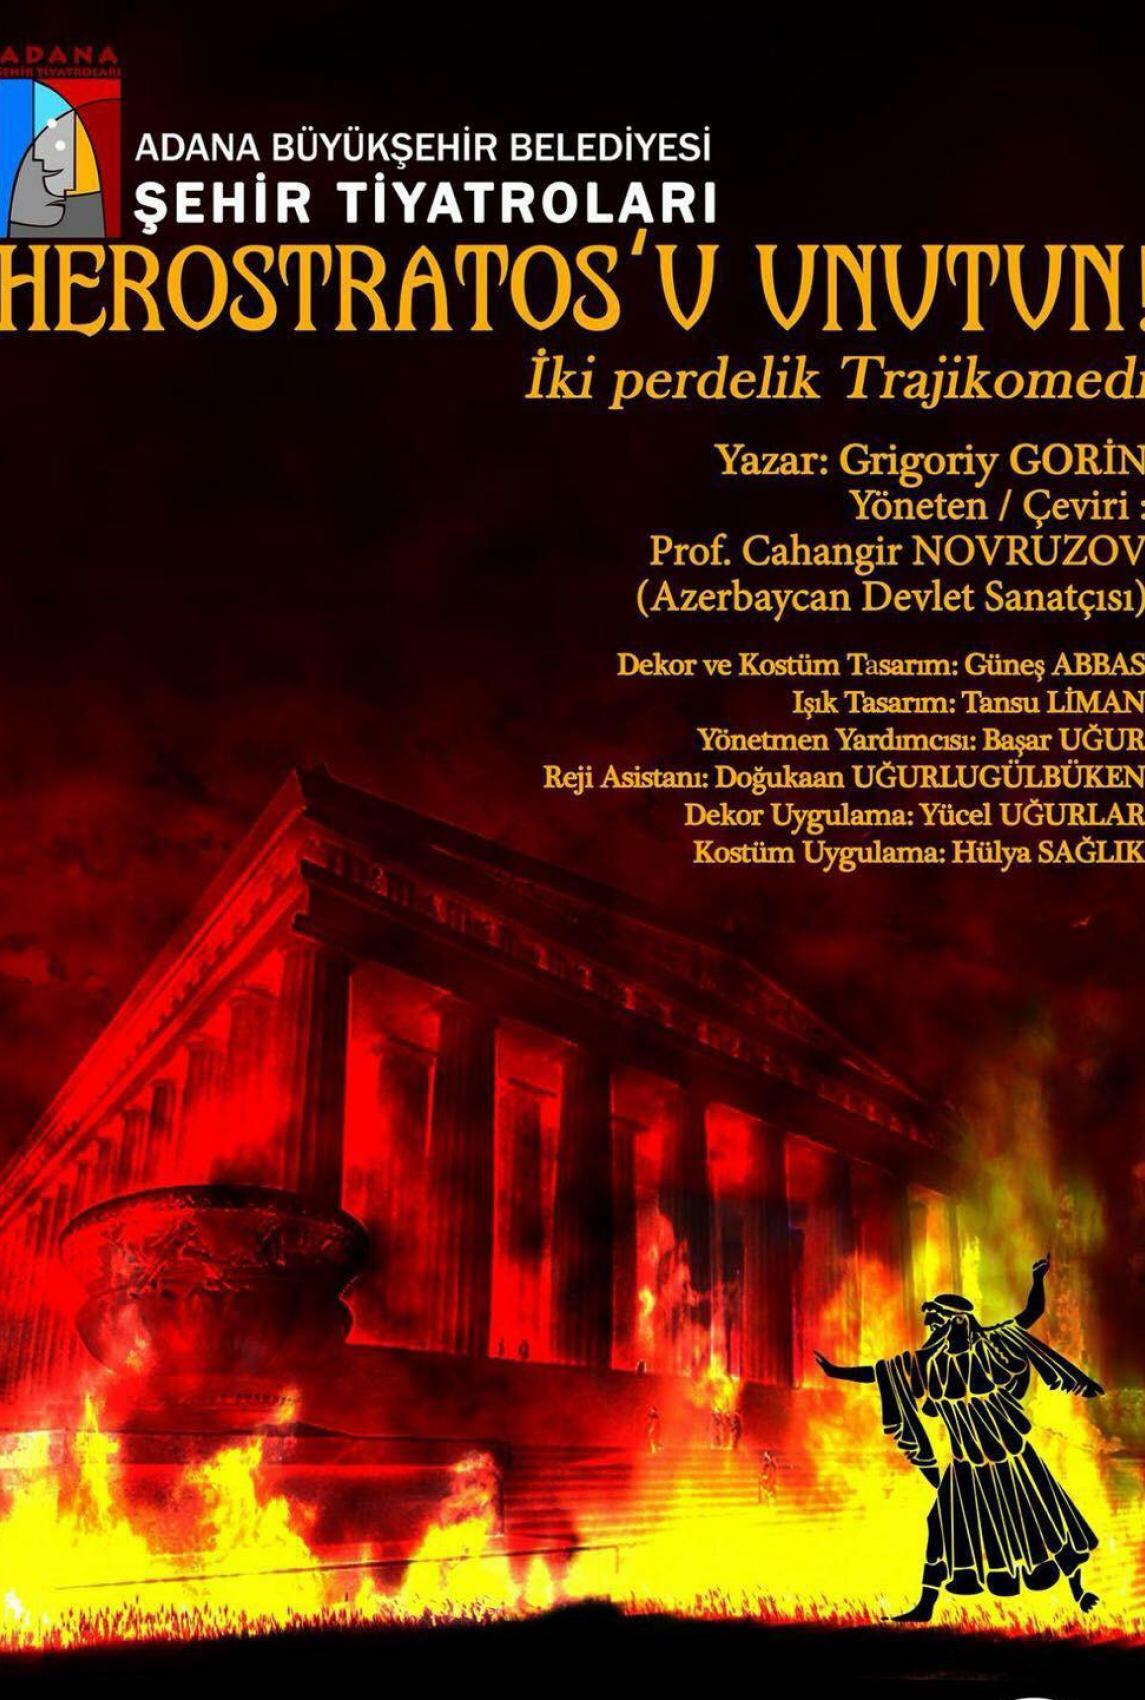 Herostratos'u Unutun!